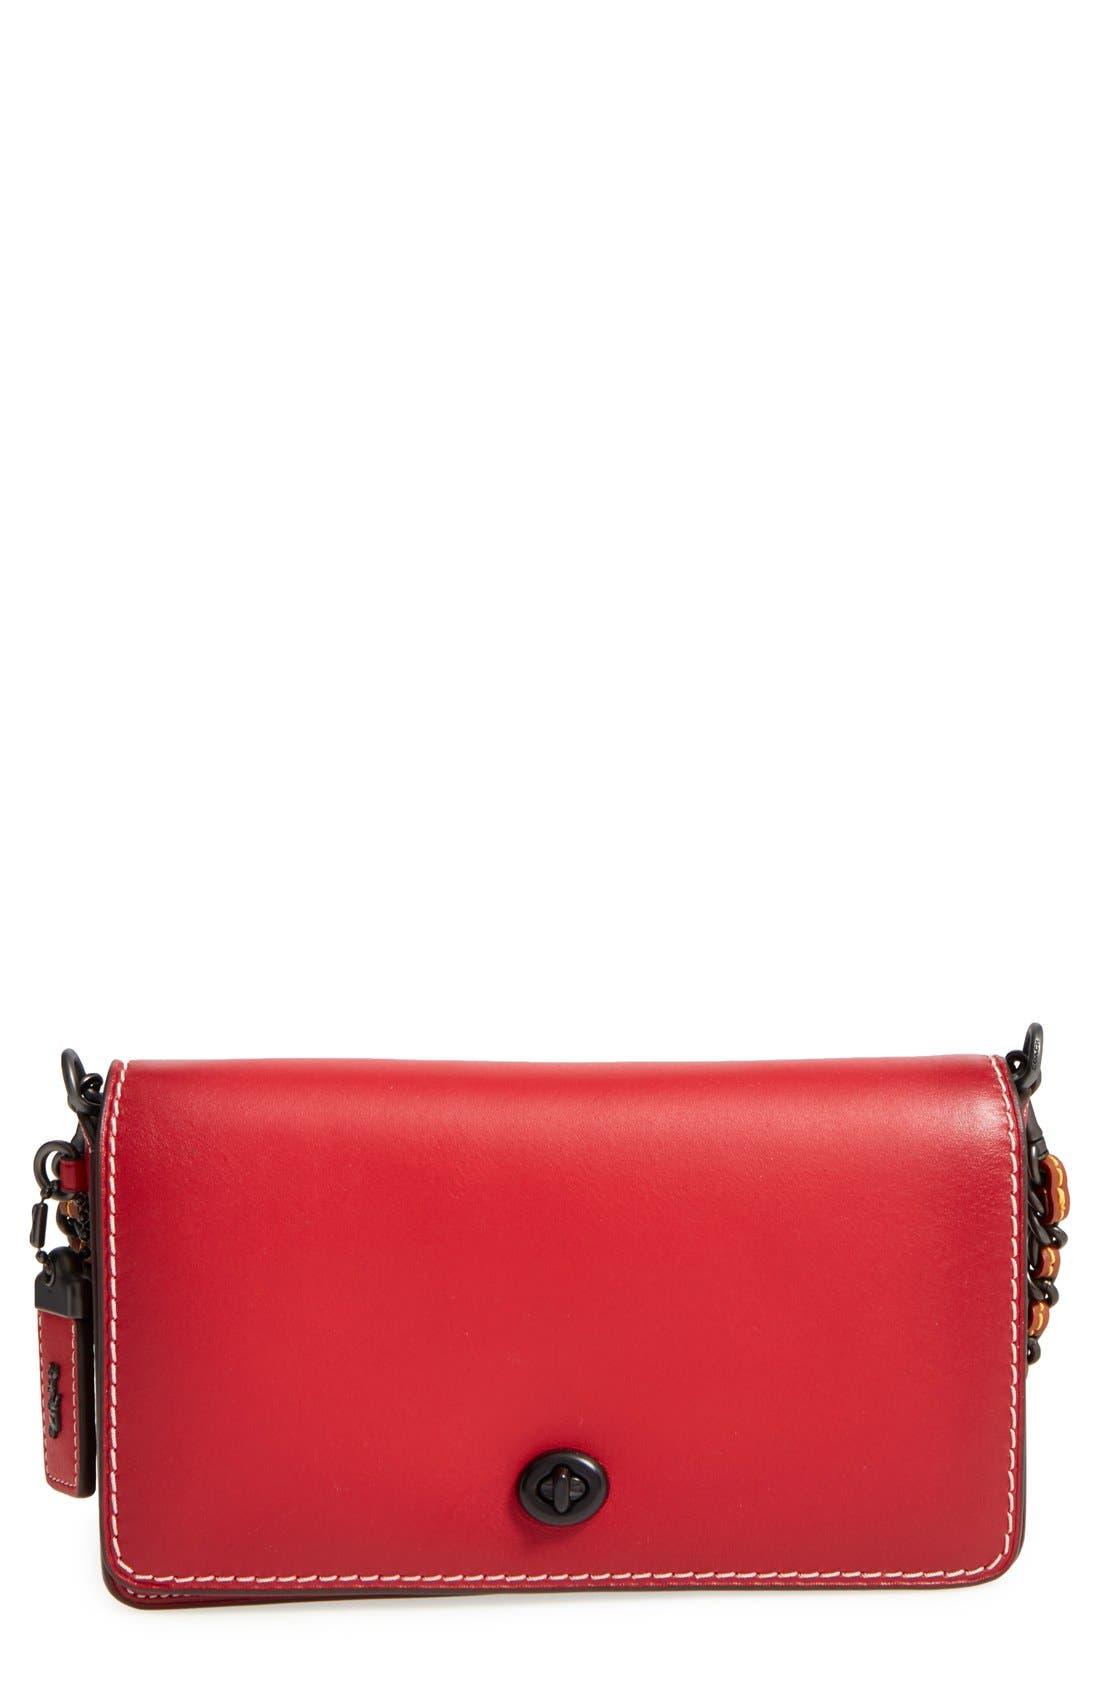 COACH 1941 'Dinky' Leather Crossbody Bag